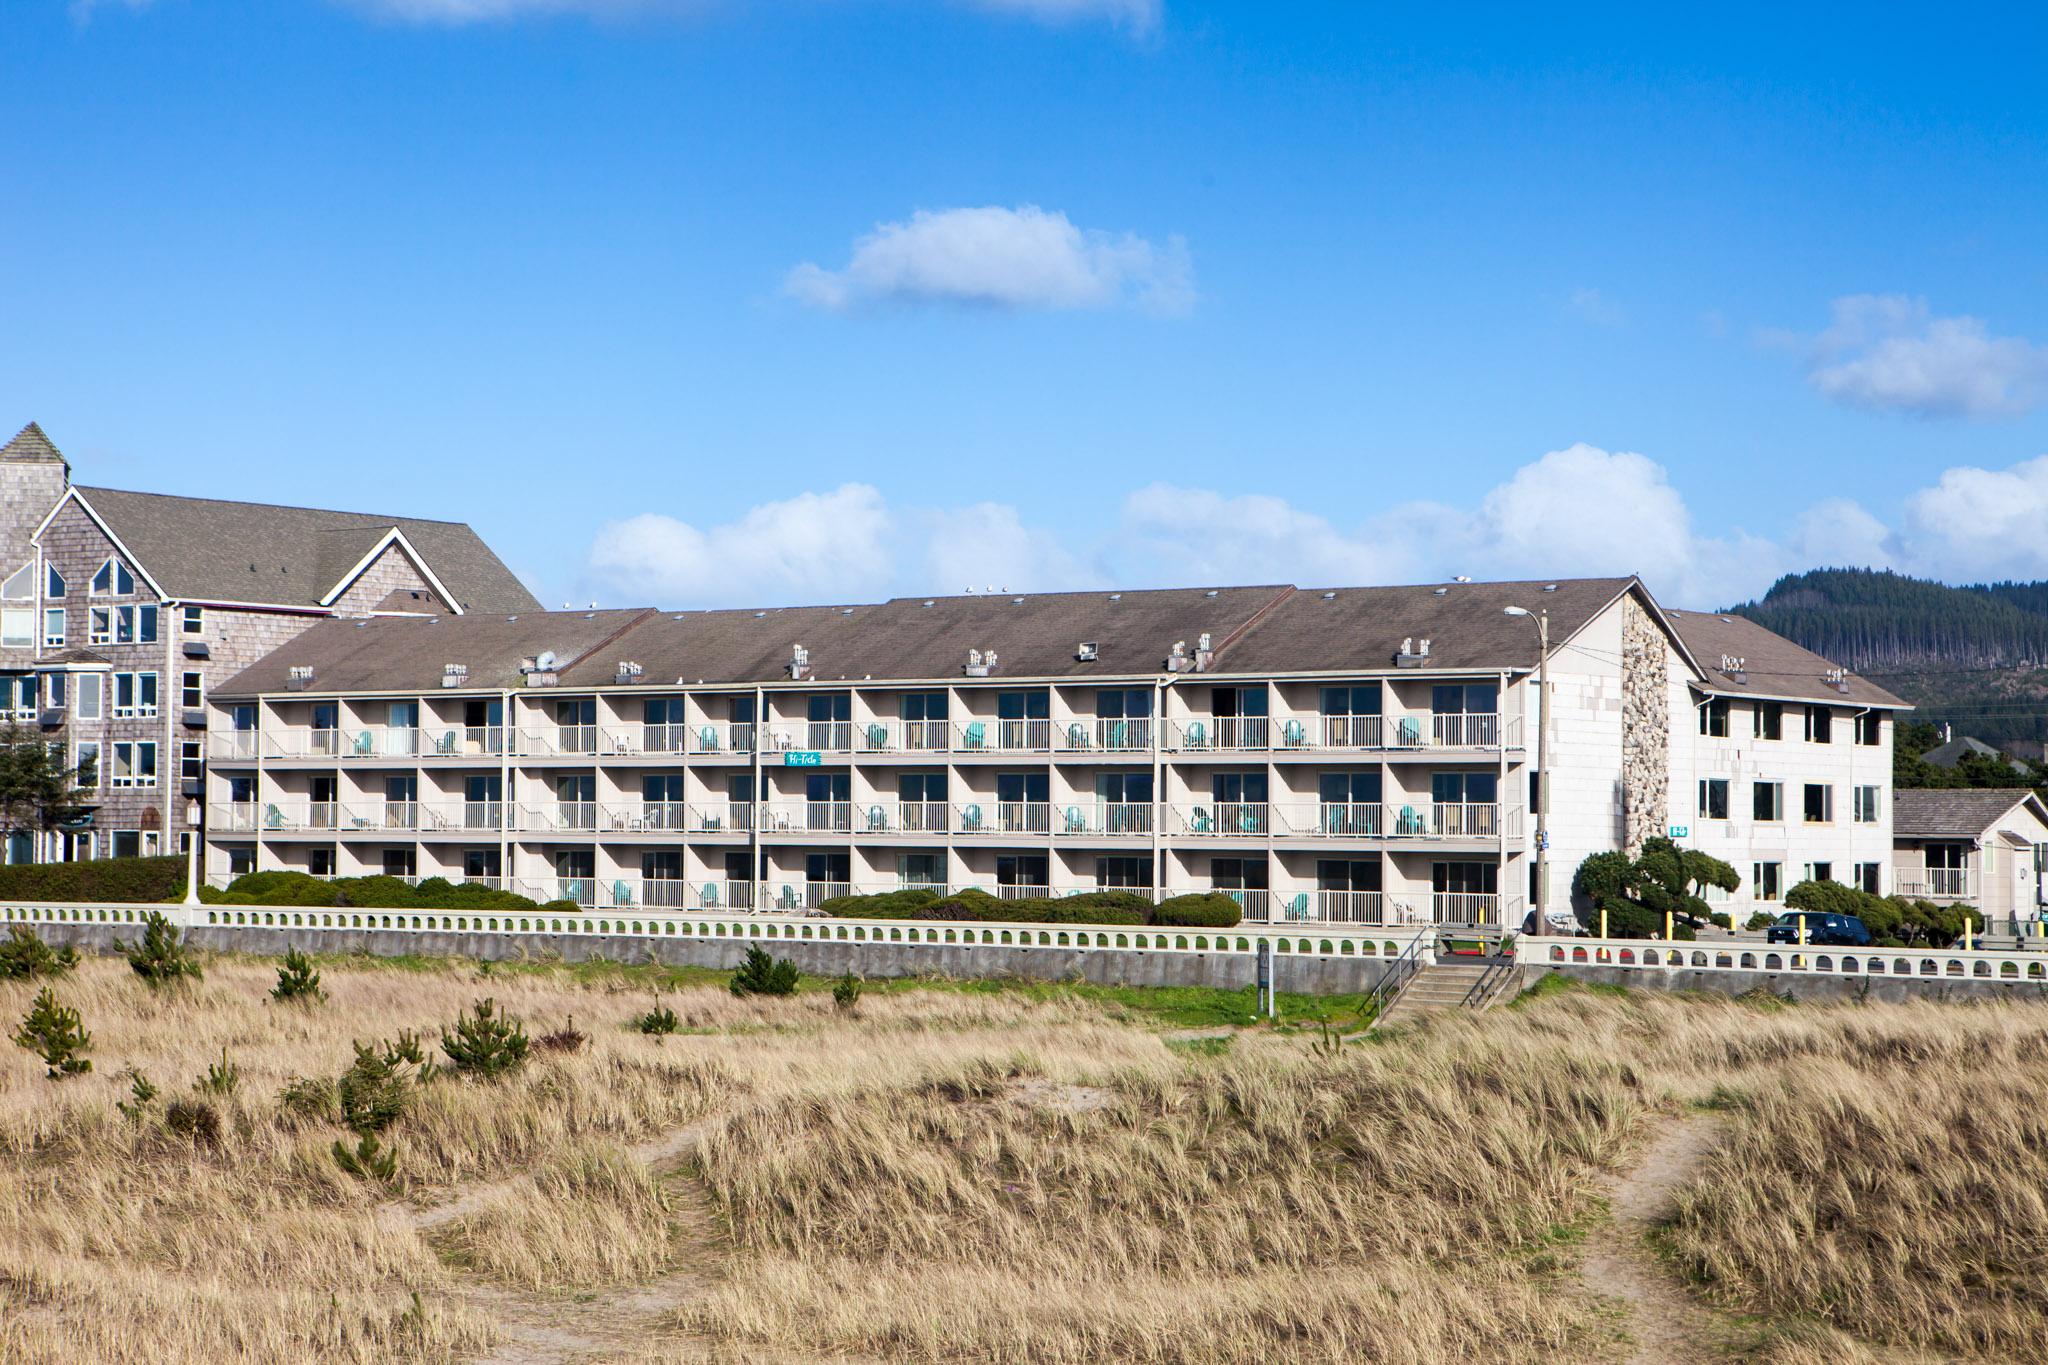 Family Friendly Seaside Oceanfront Hotel Near Local